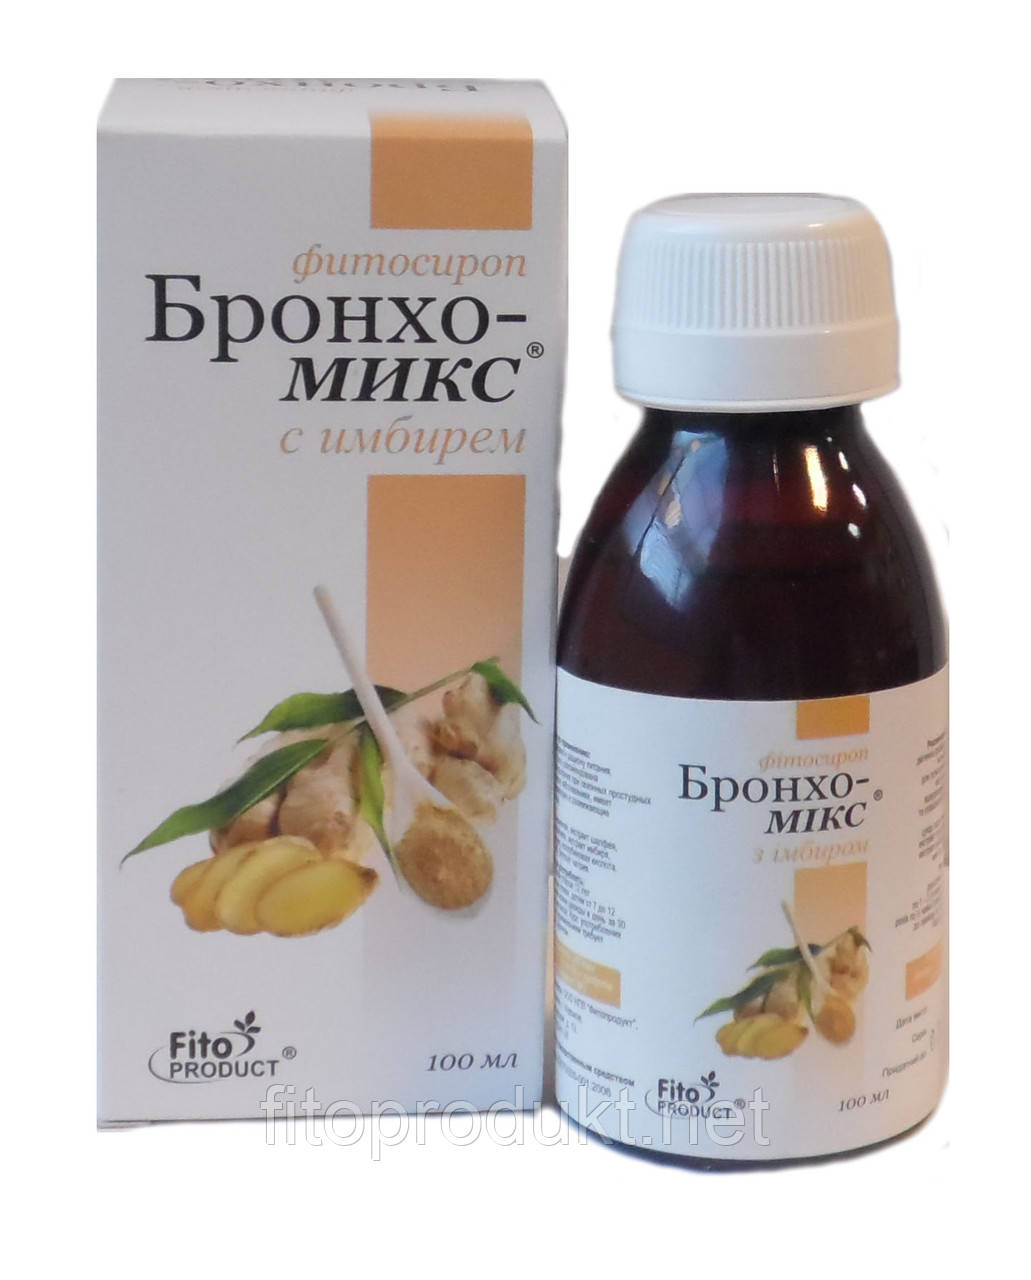 Бронхо-микс фитосироп с имбирем, 100мл, Fito Produkt™